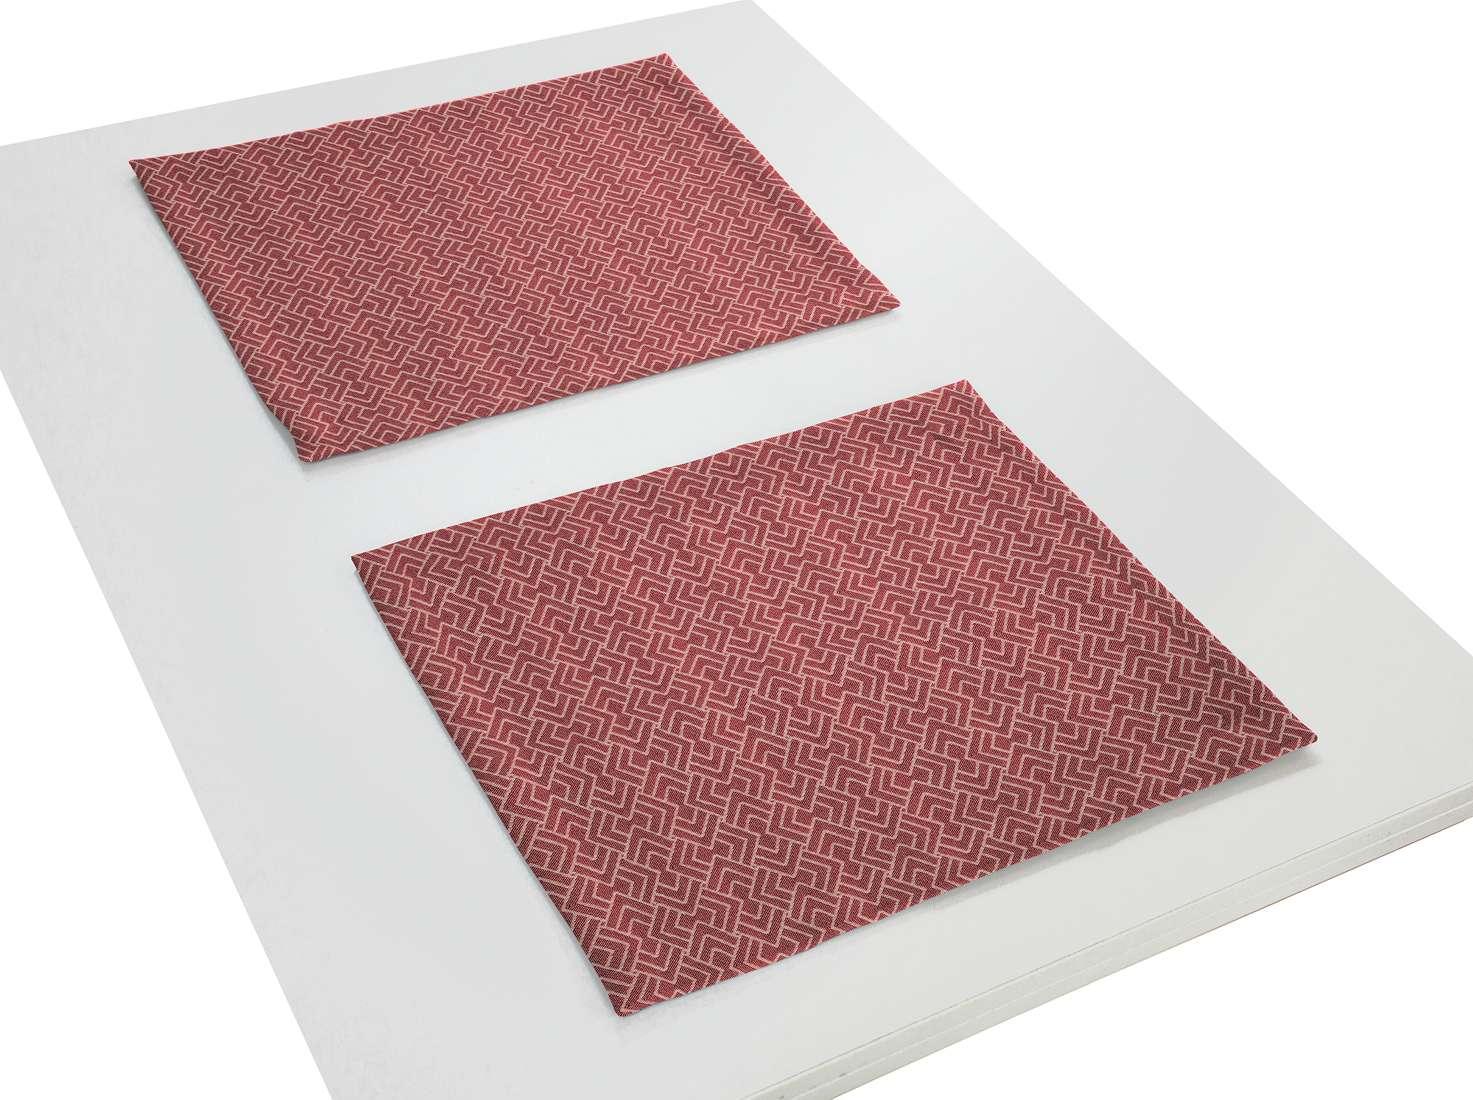 Graphic Ventus (Tischsets)